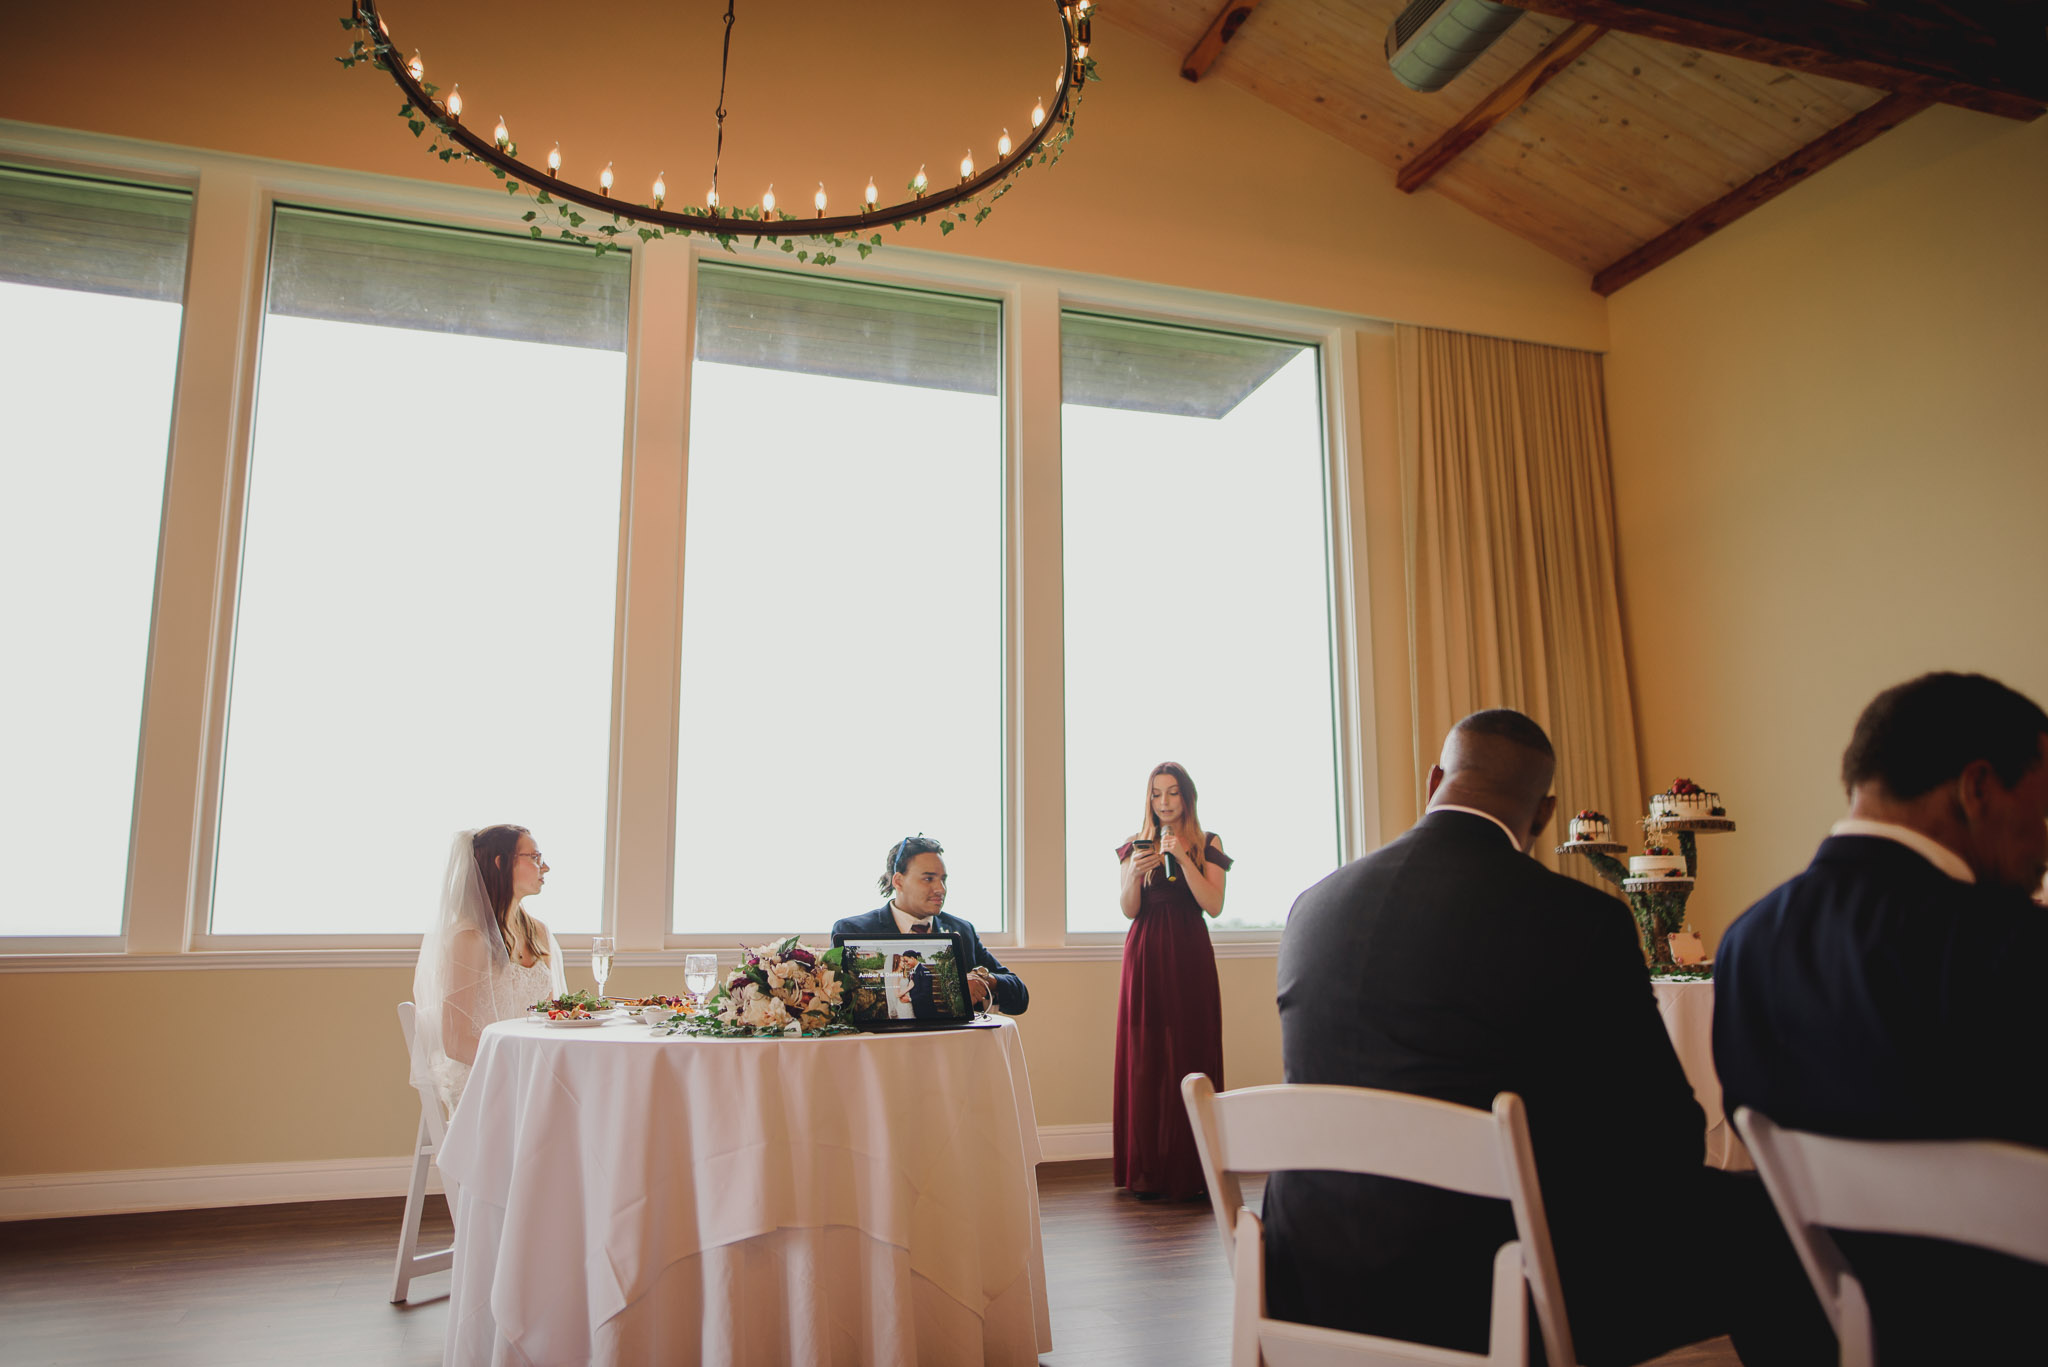 Austin-Texas-Wedding-Vintage-Villas-0039.jpg